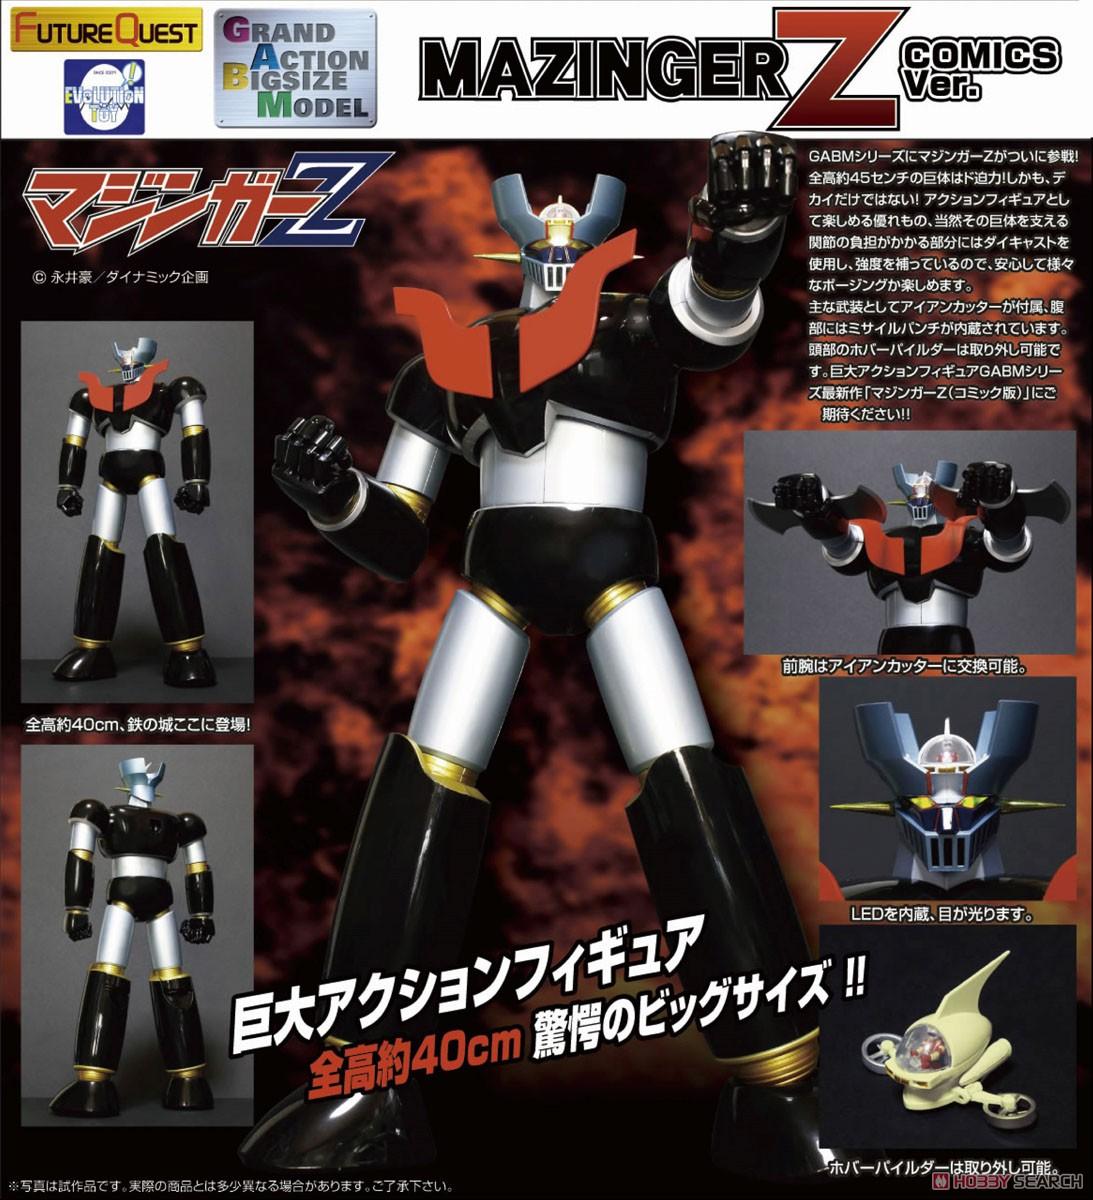 GRAND ACTION BIGSIZE MODEL『マジンガーZ コミック版』可動フィギュア-009